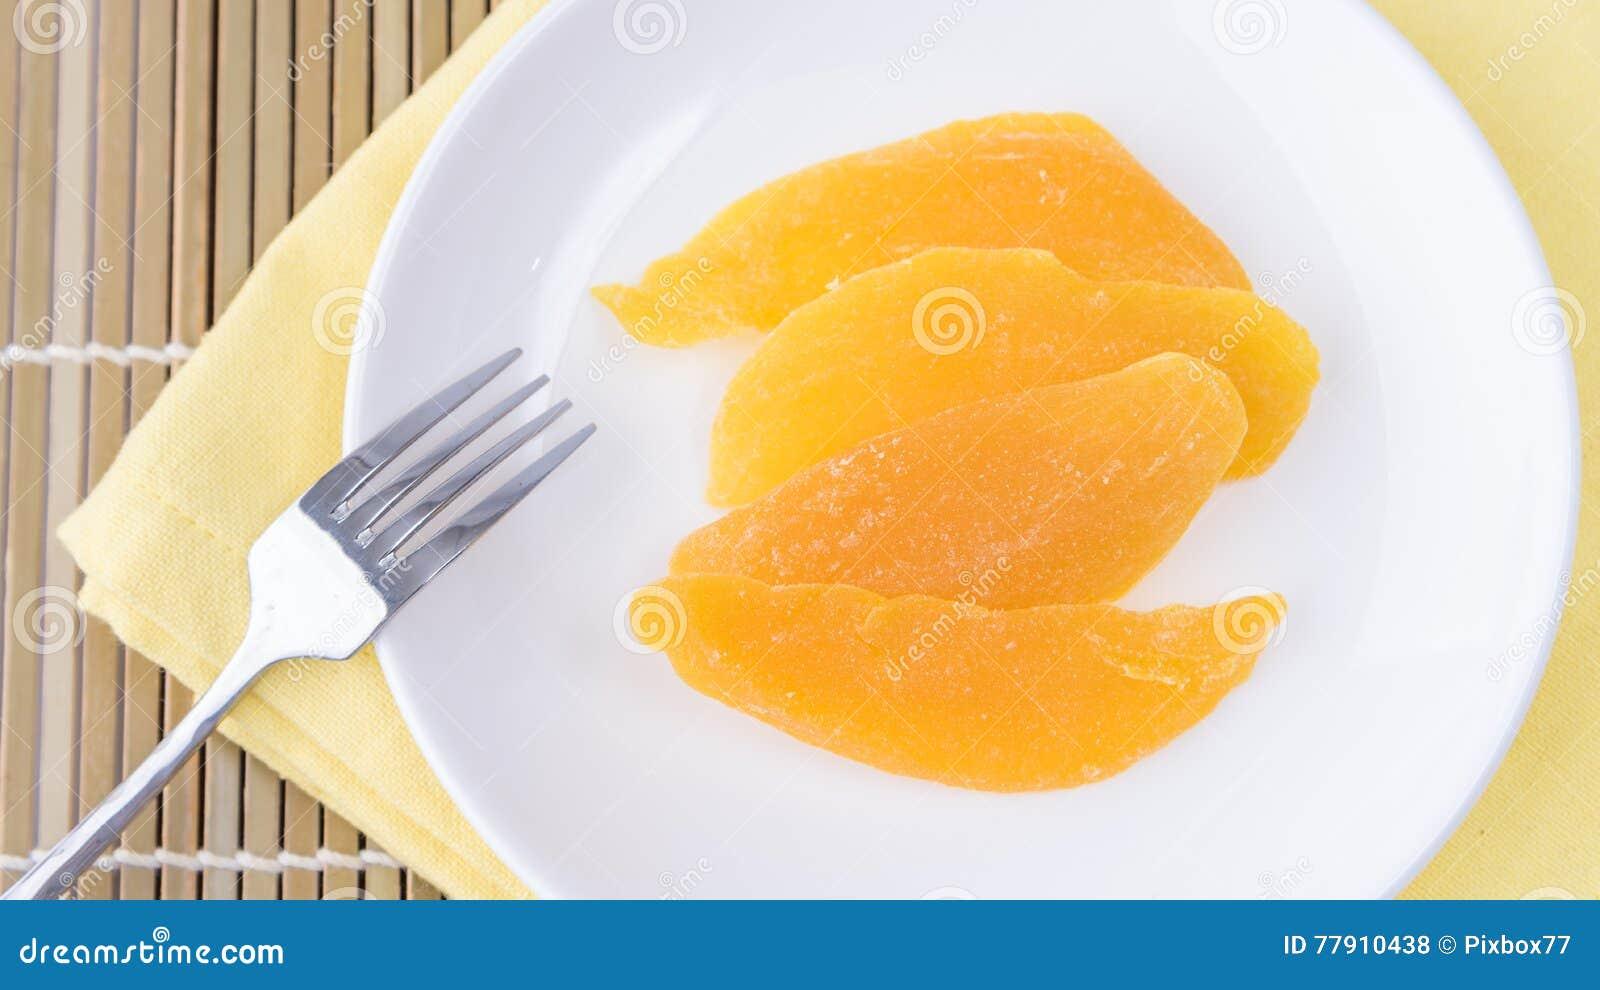 Dried Mango In White Dish Stock Photo Image: 77910438